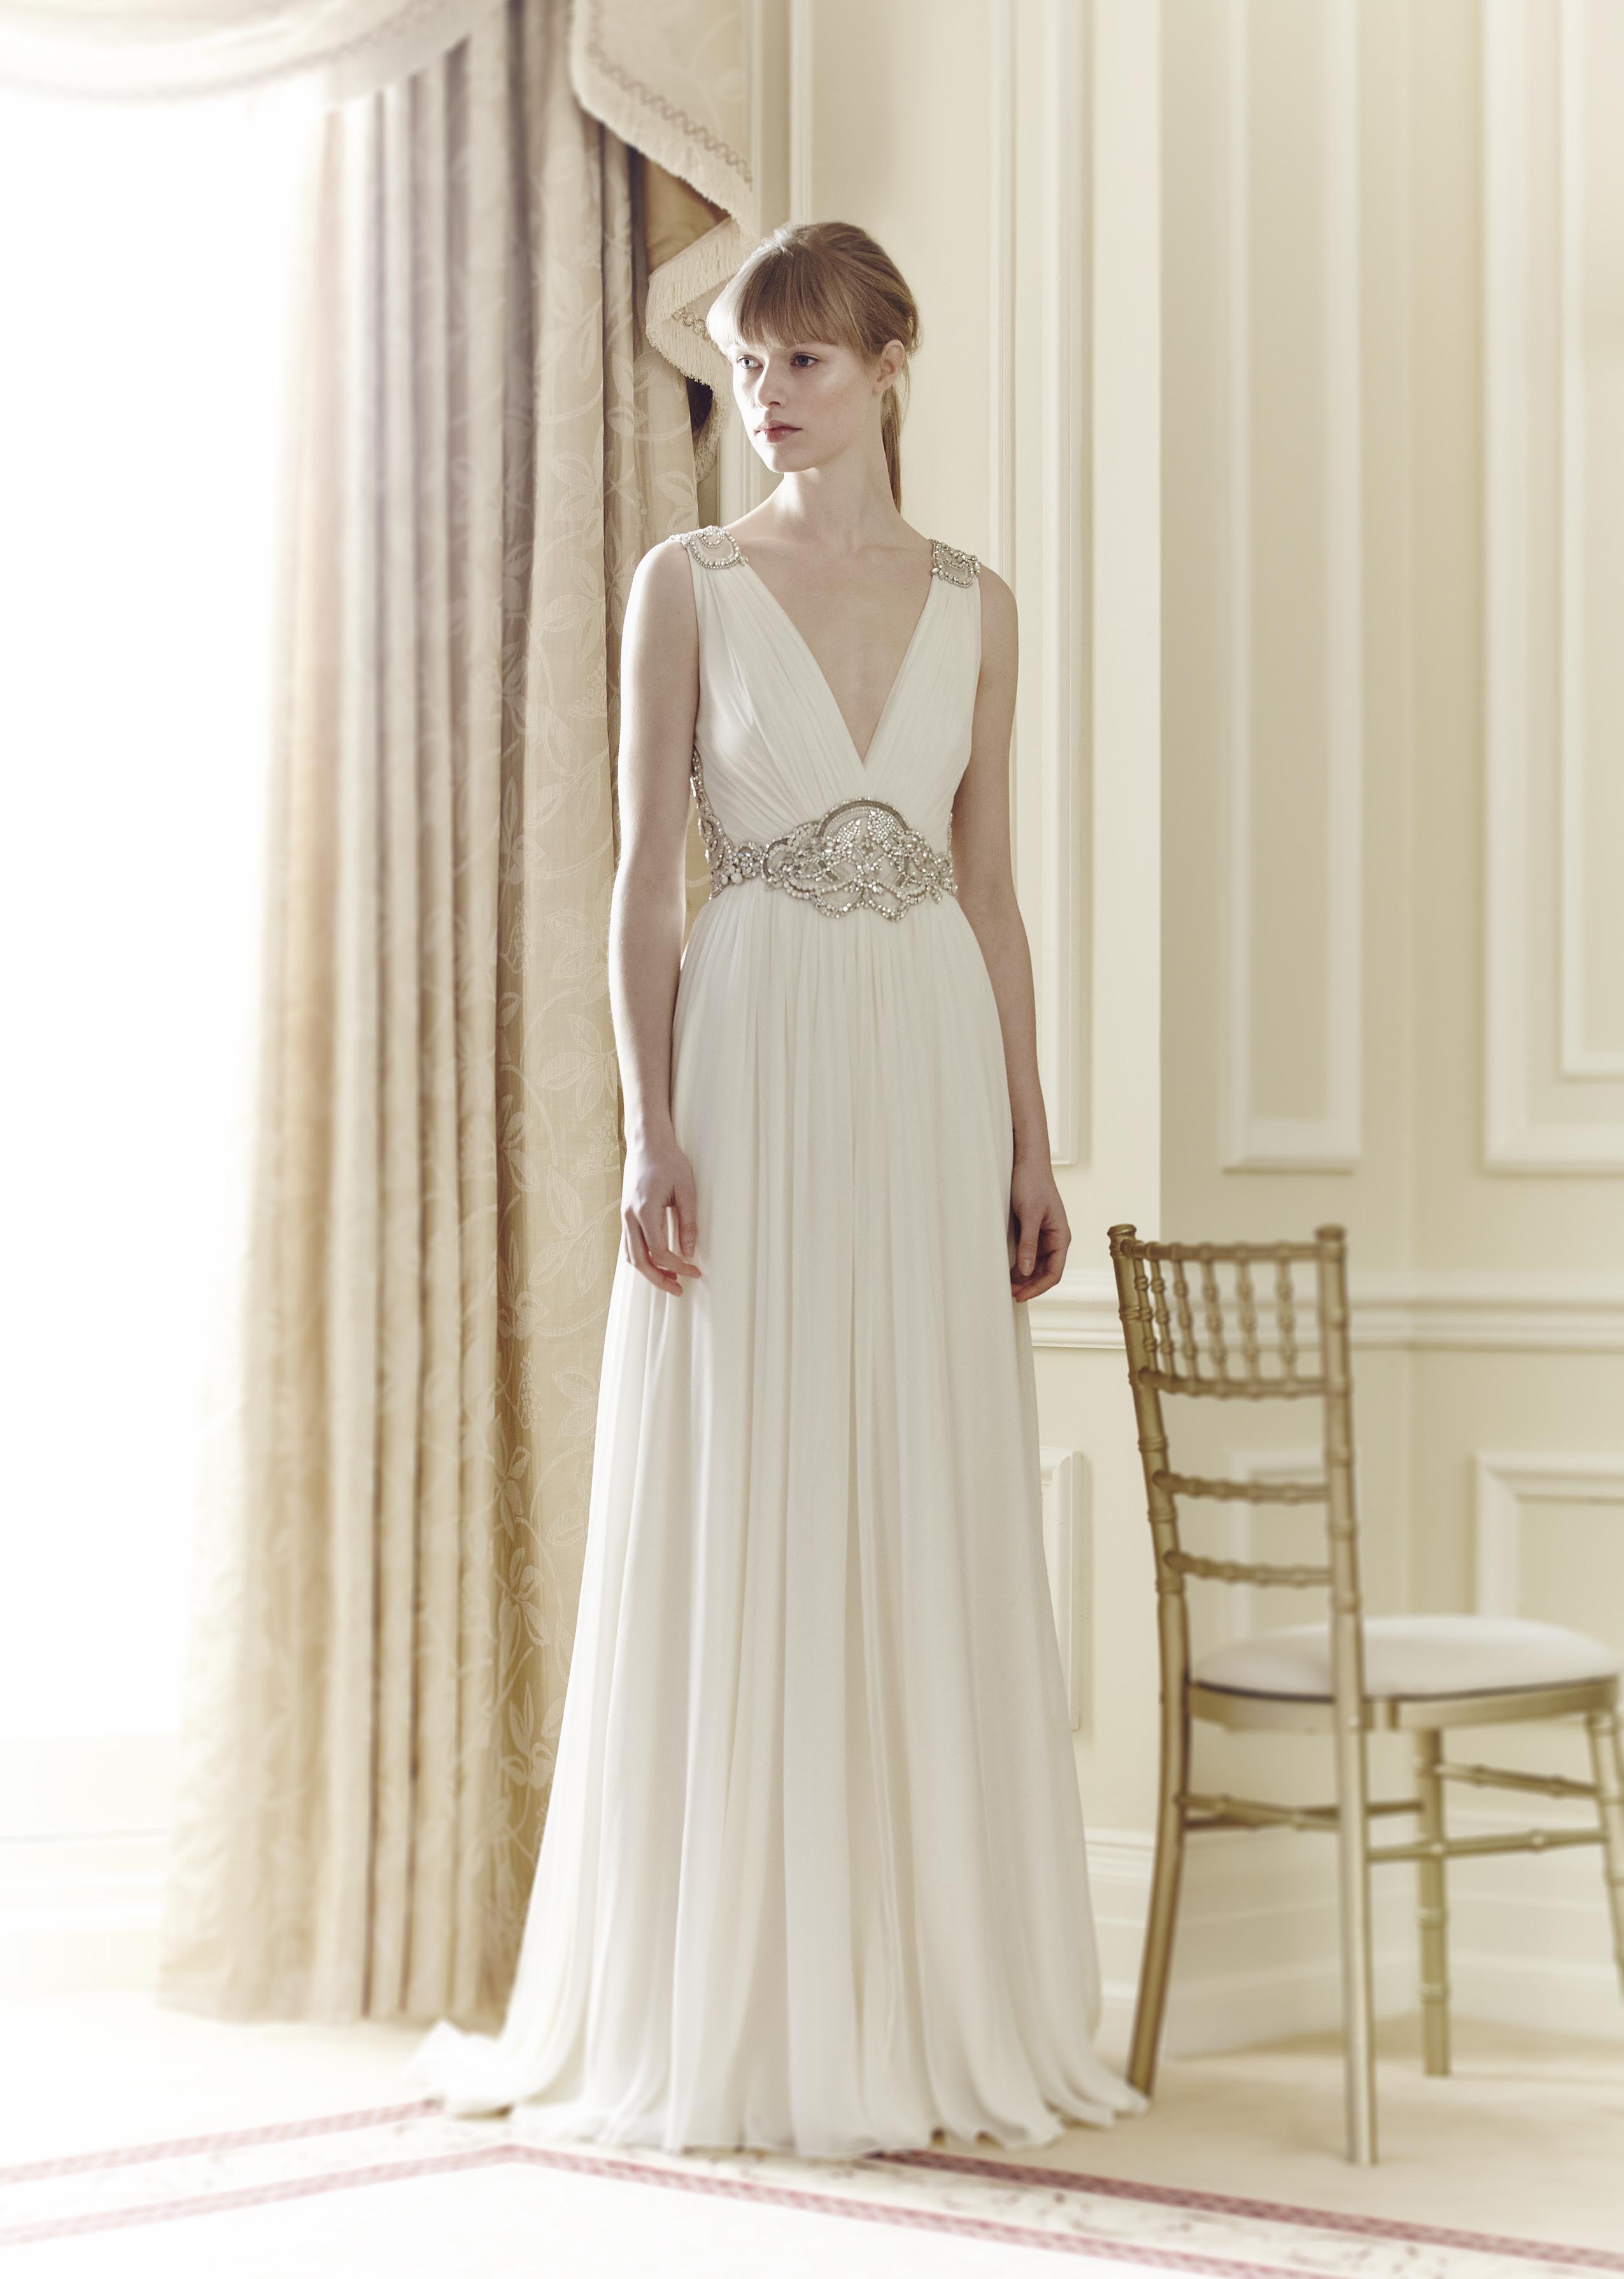 Jenny packham bridal collection spring summer 2014 wedding for Jenny packham wedding dress